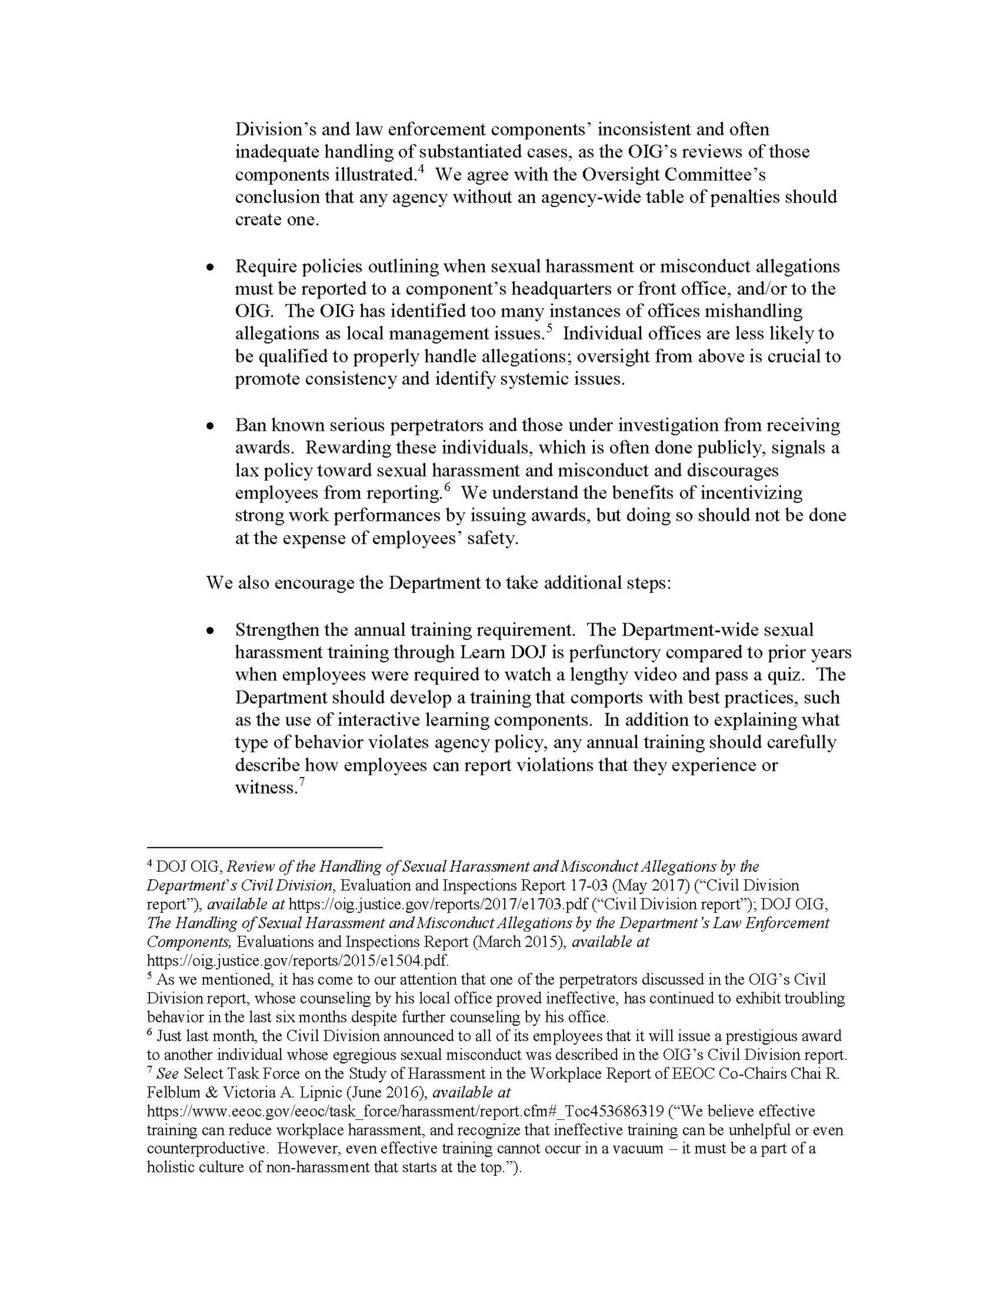 Thank-you letter -- DAG Rosenstein's office_Page_2.jpg